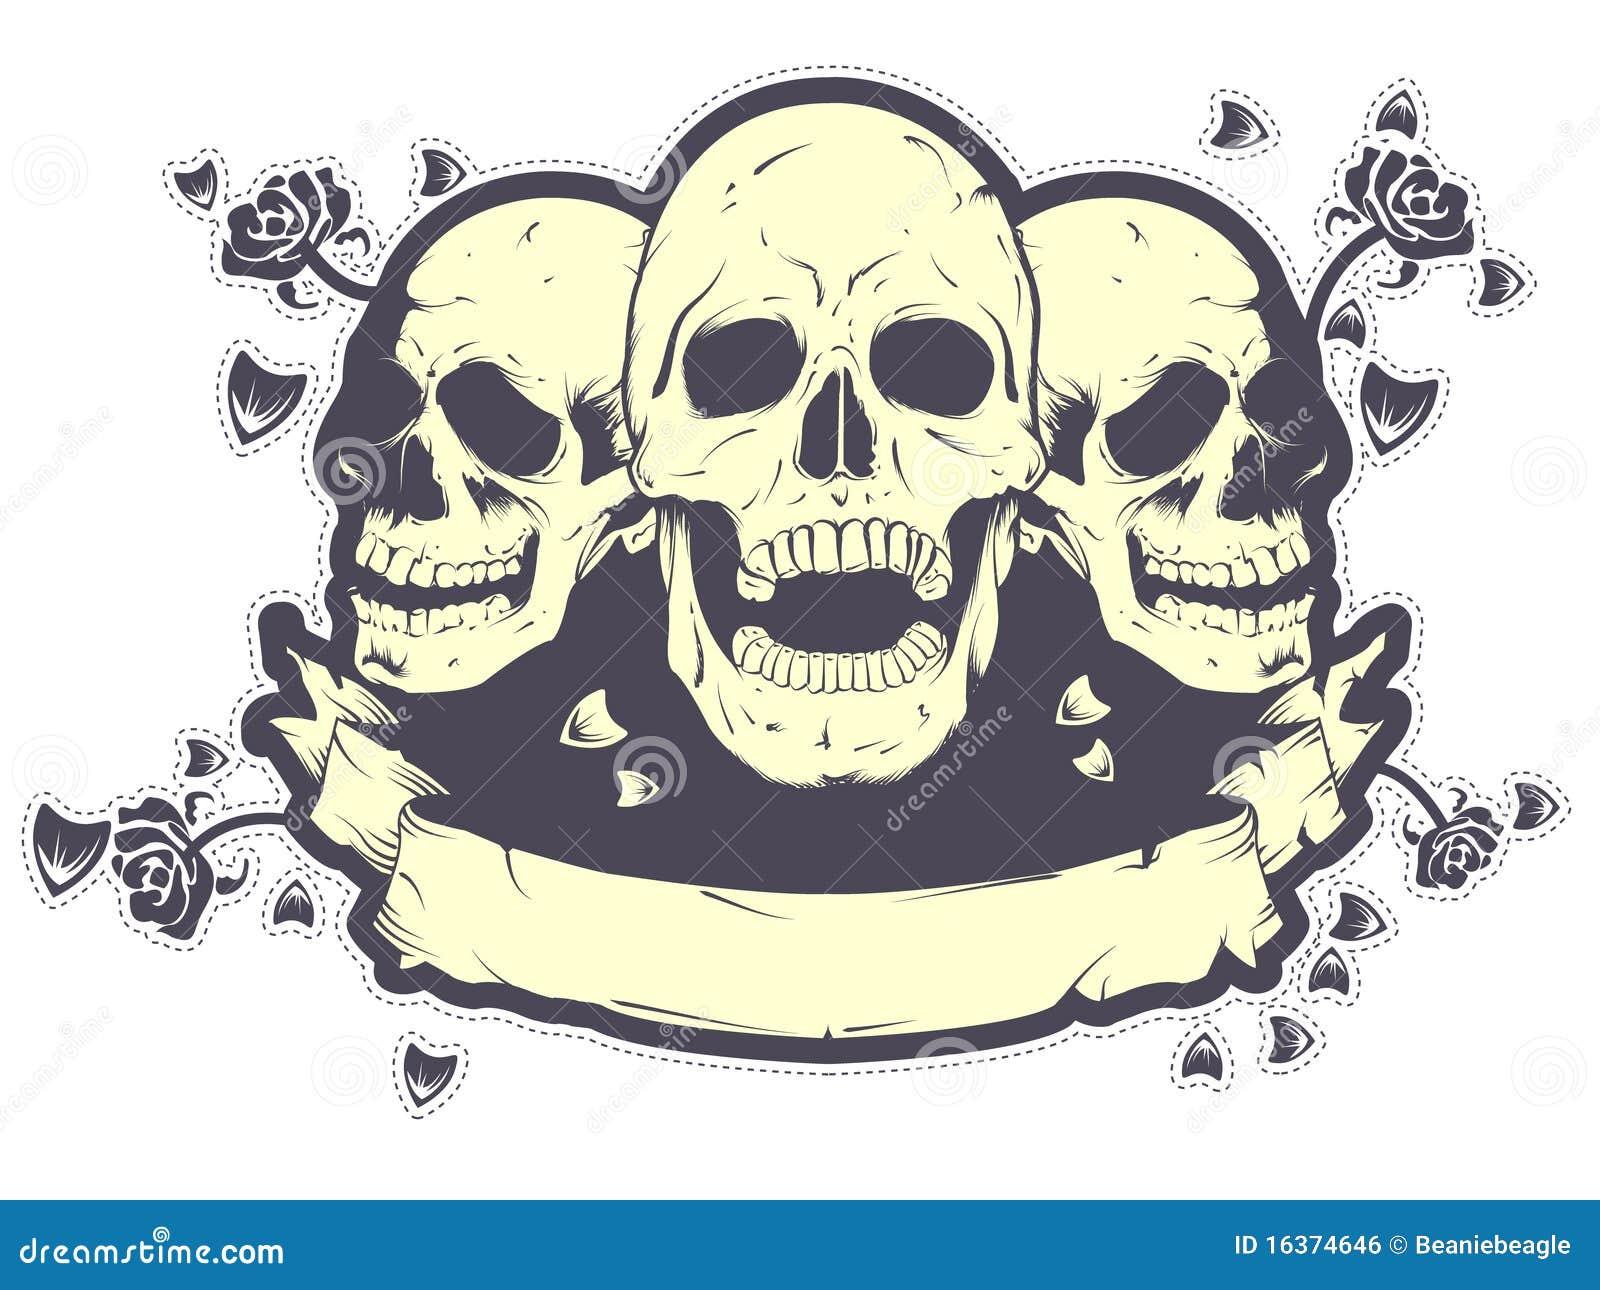 Skull T Shirt Design Royalty Free Stock Image Image